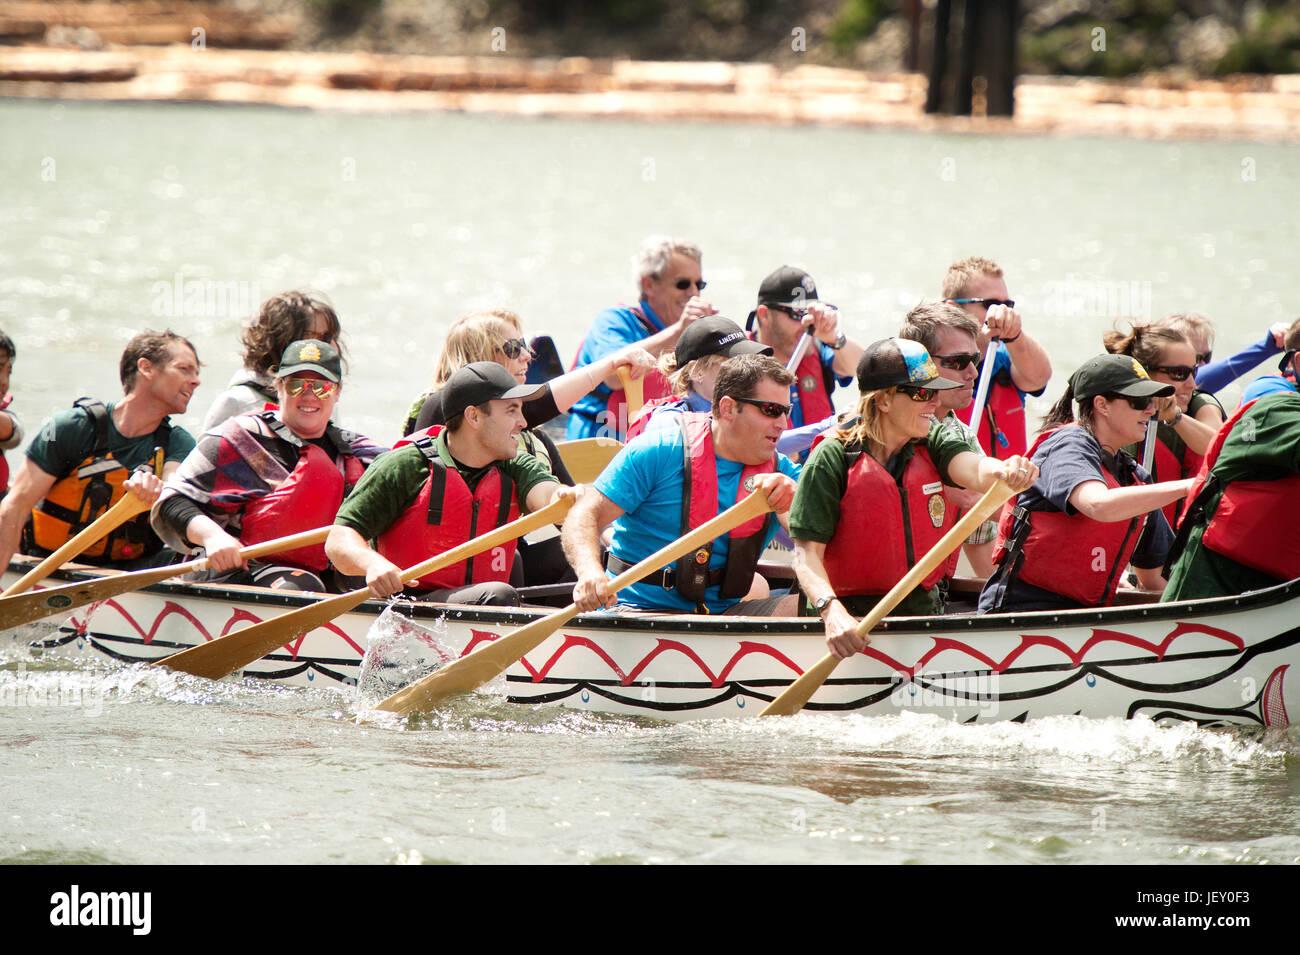 National Aboriginal Day canoe races at the Stawamus Waterfront.  Squamish BC, Canada. - Stock Image